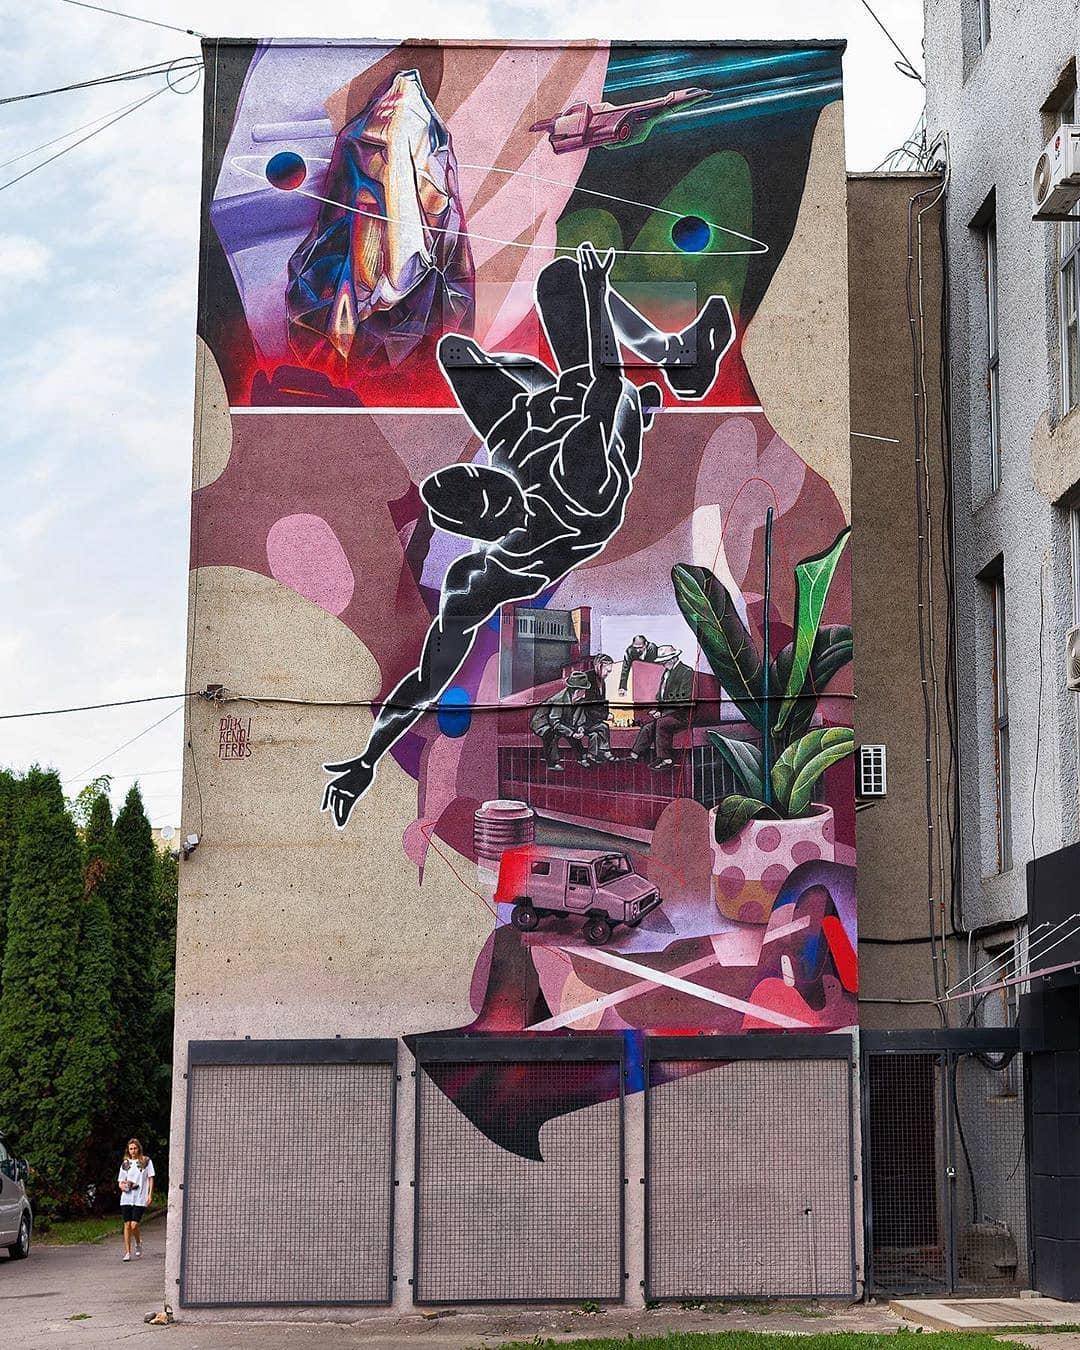 Sergiy Greh + Dilkone + Keno Kickit @ Lutsk, Ukraine